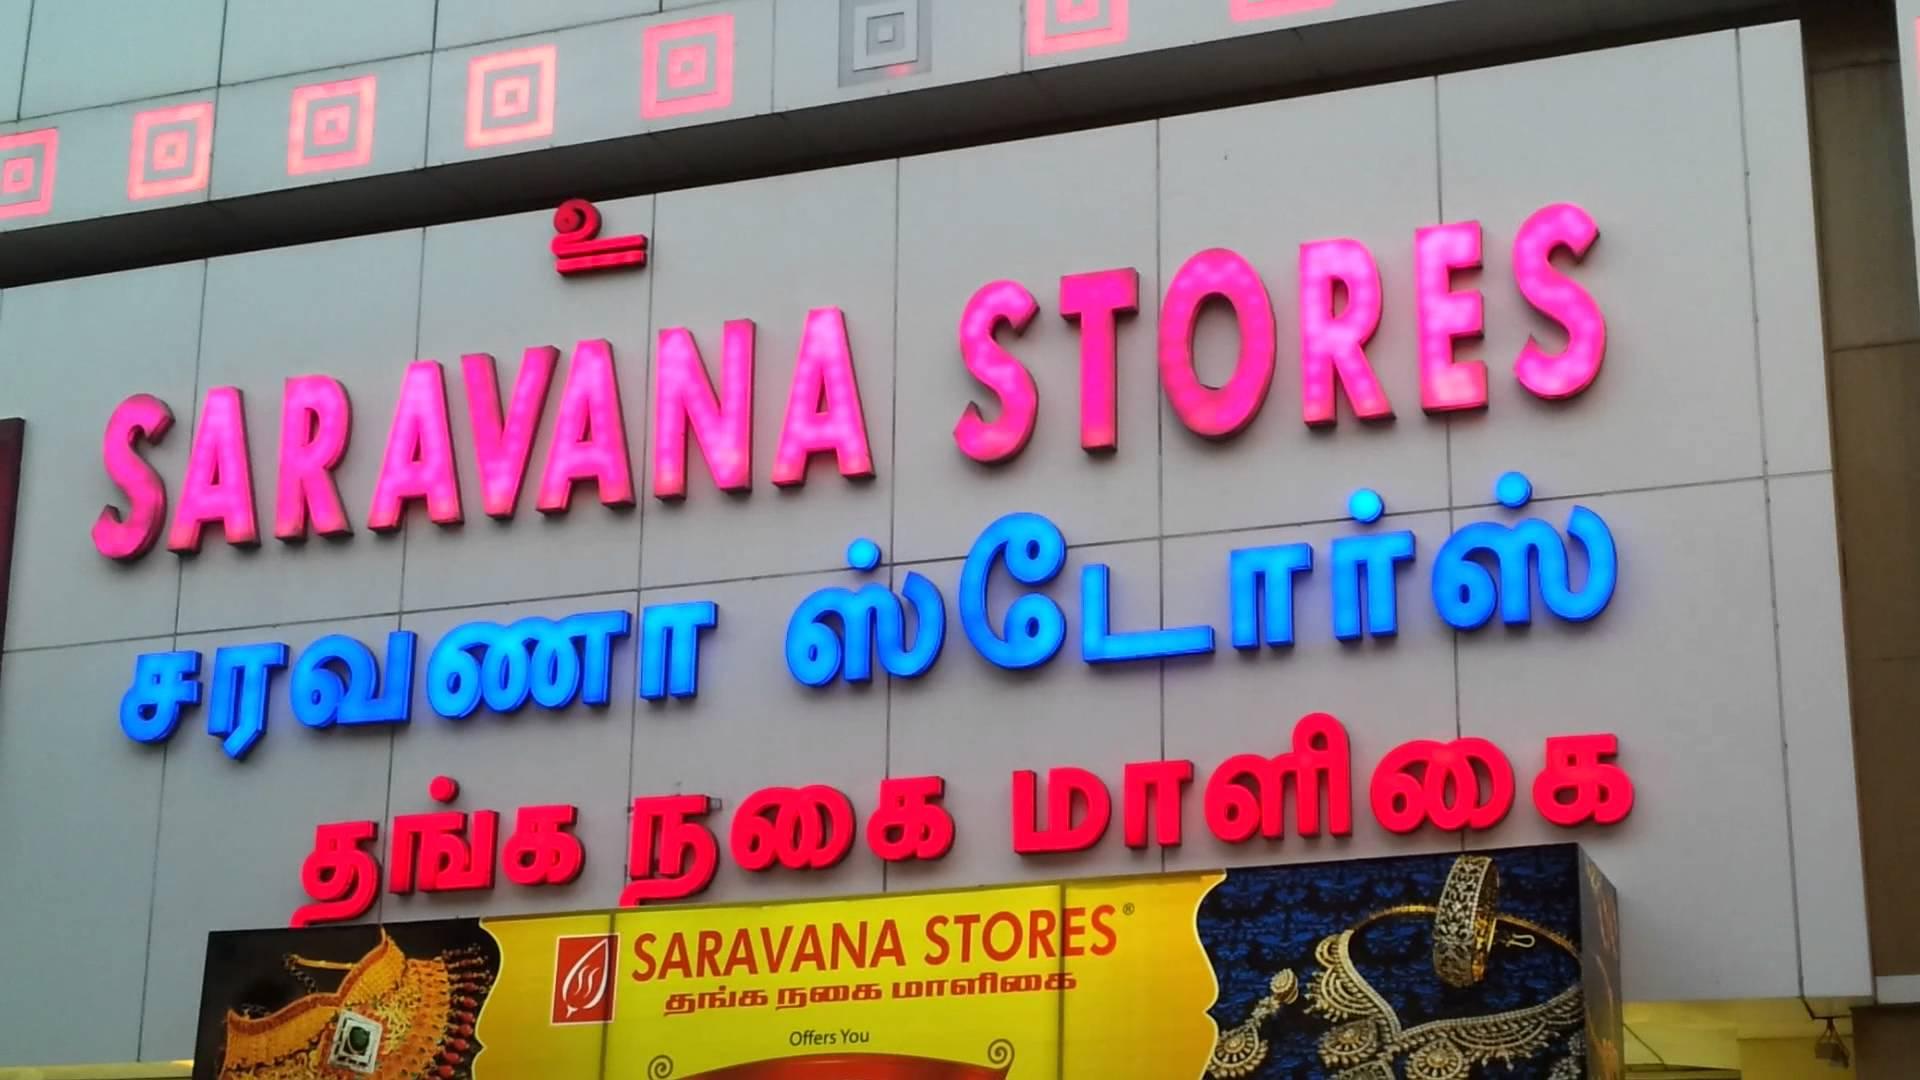 Uncategorized Saravana Stores Kitchen Appliances saravana stores chennai reviews image